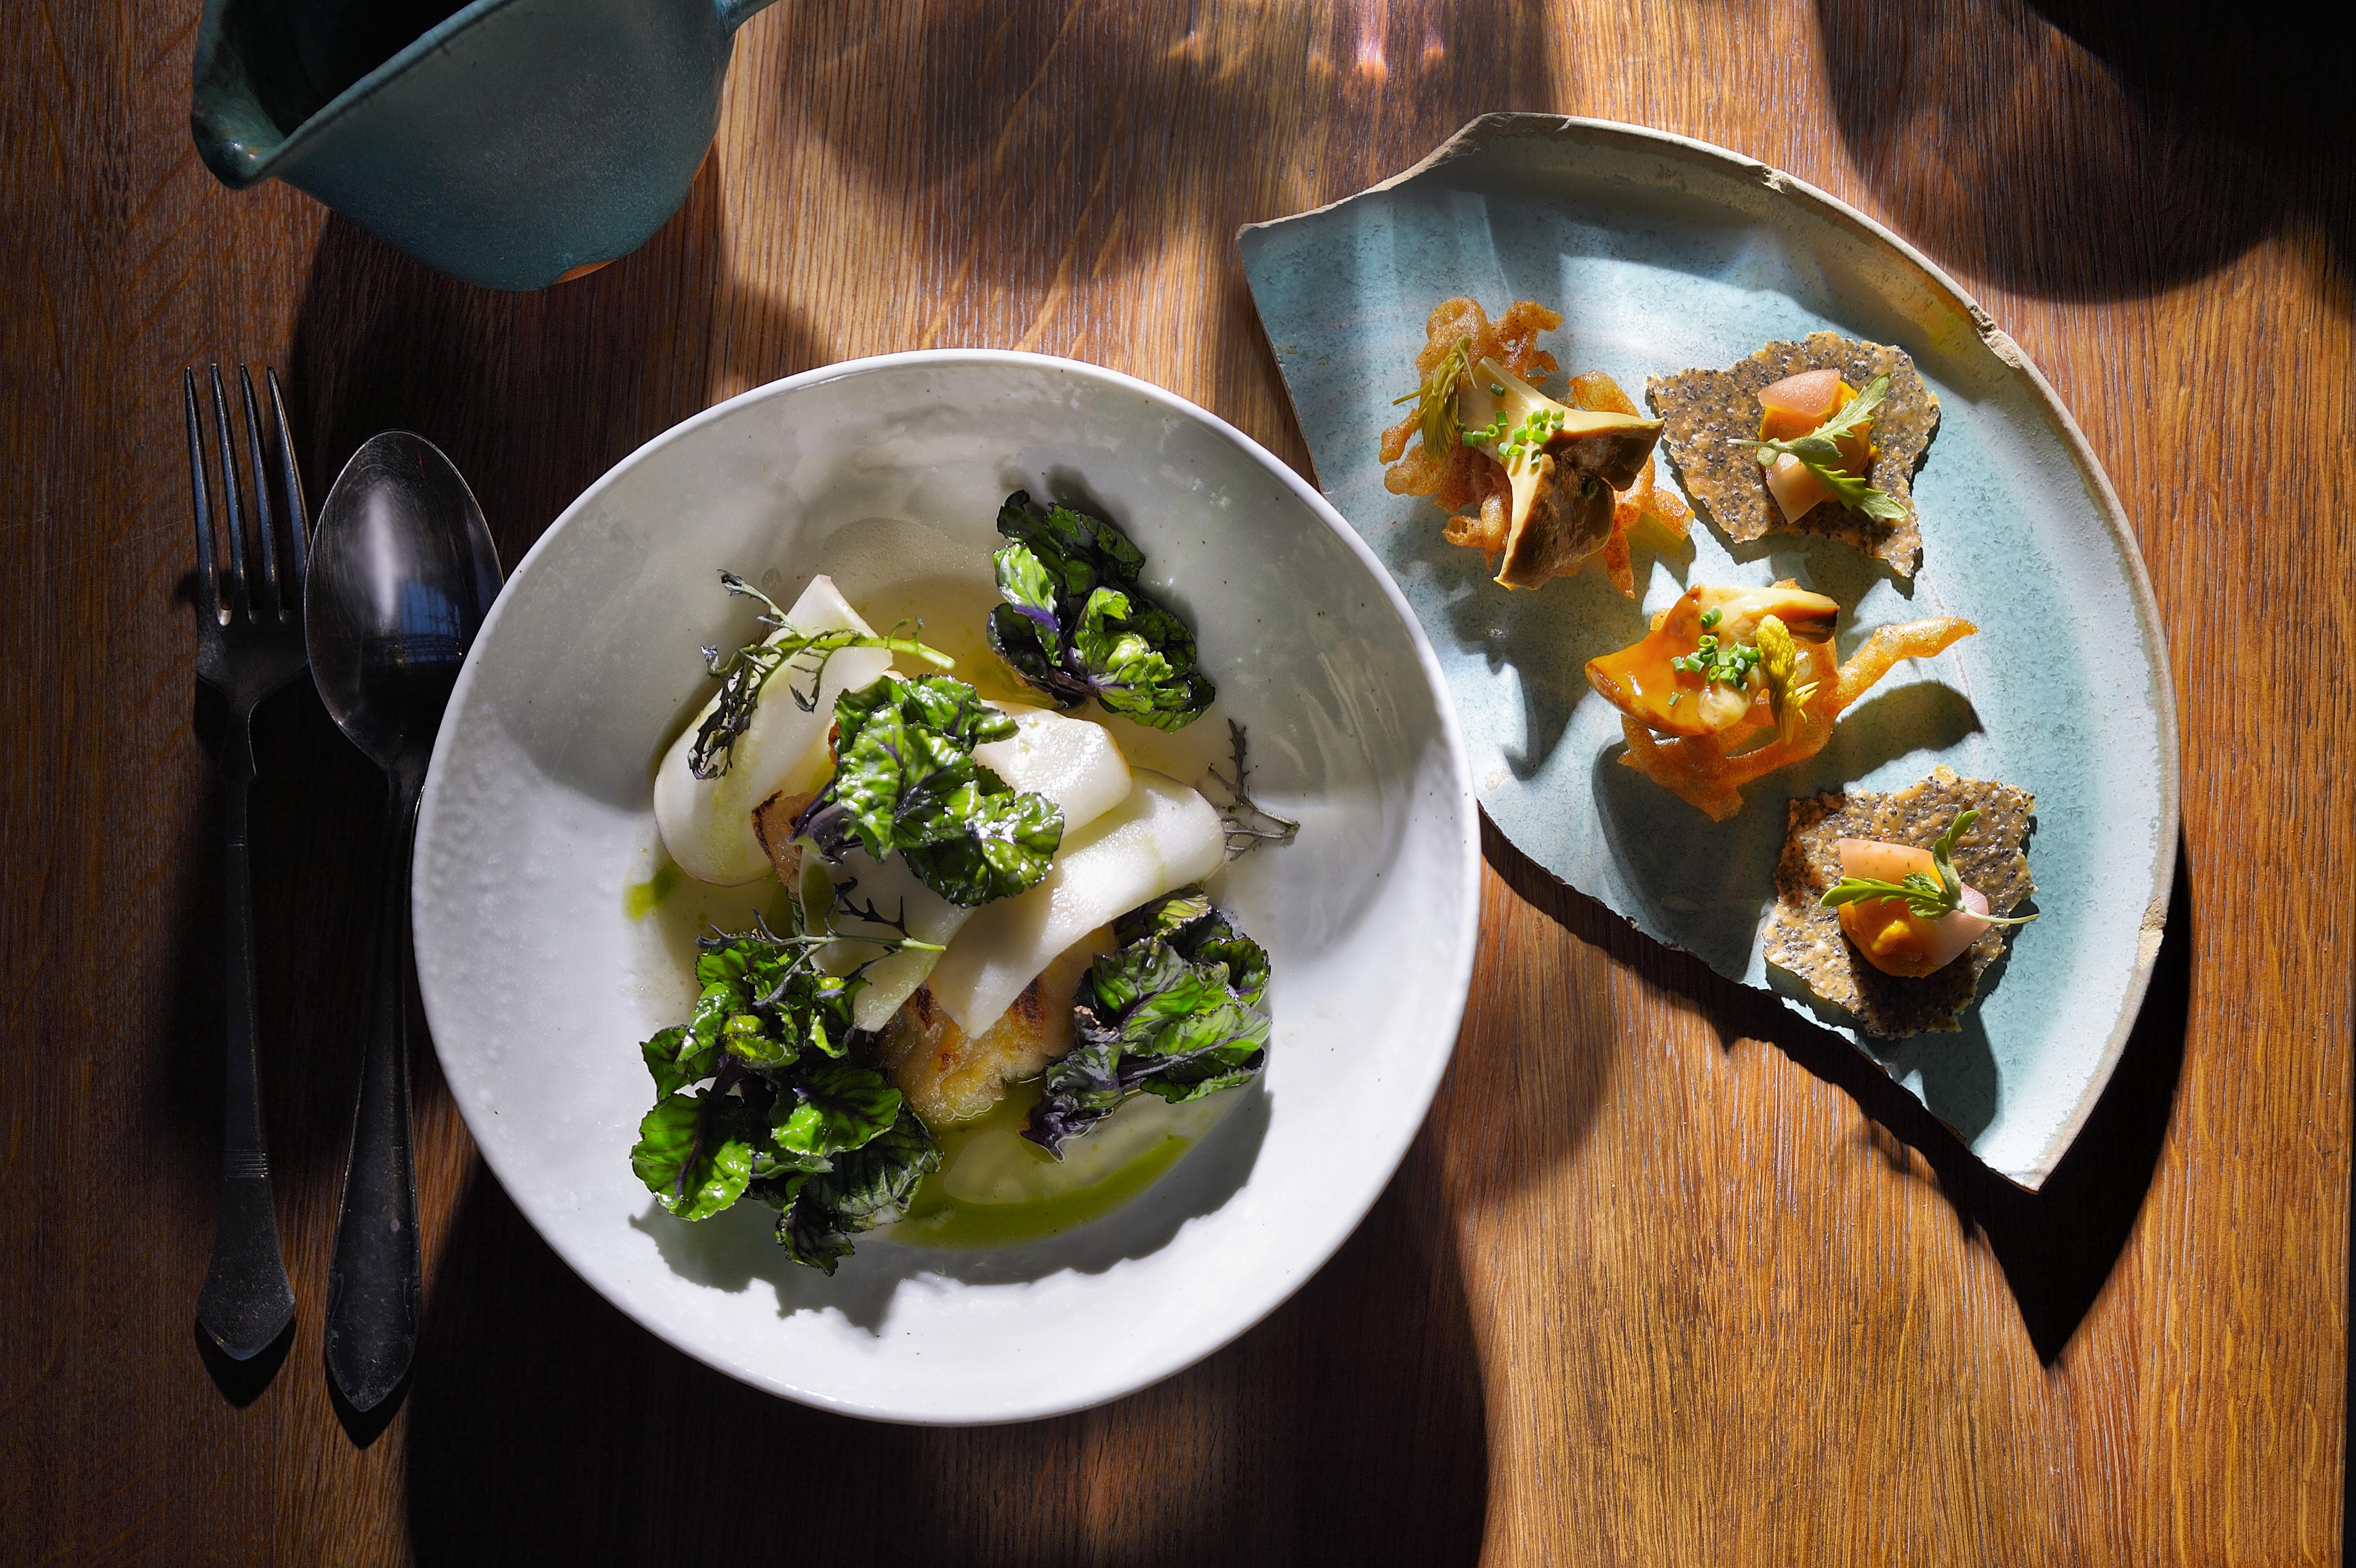 Grilovaný sumec, kapusta, celer, uzený vývar